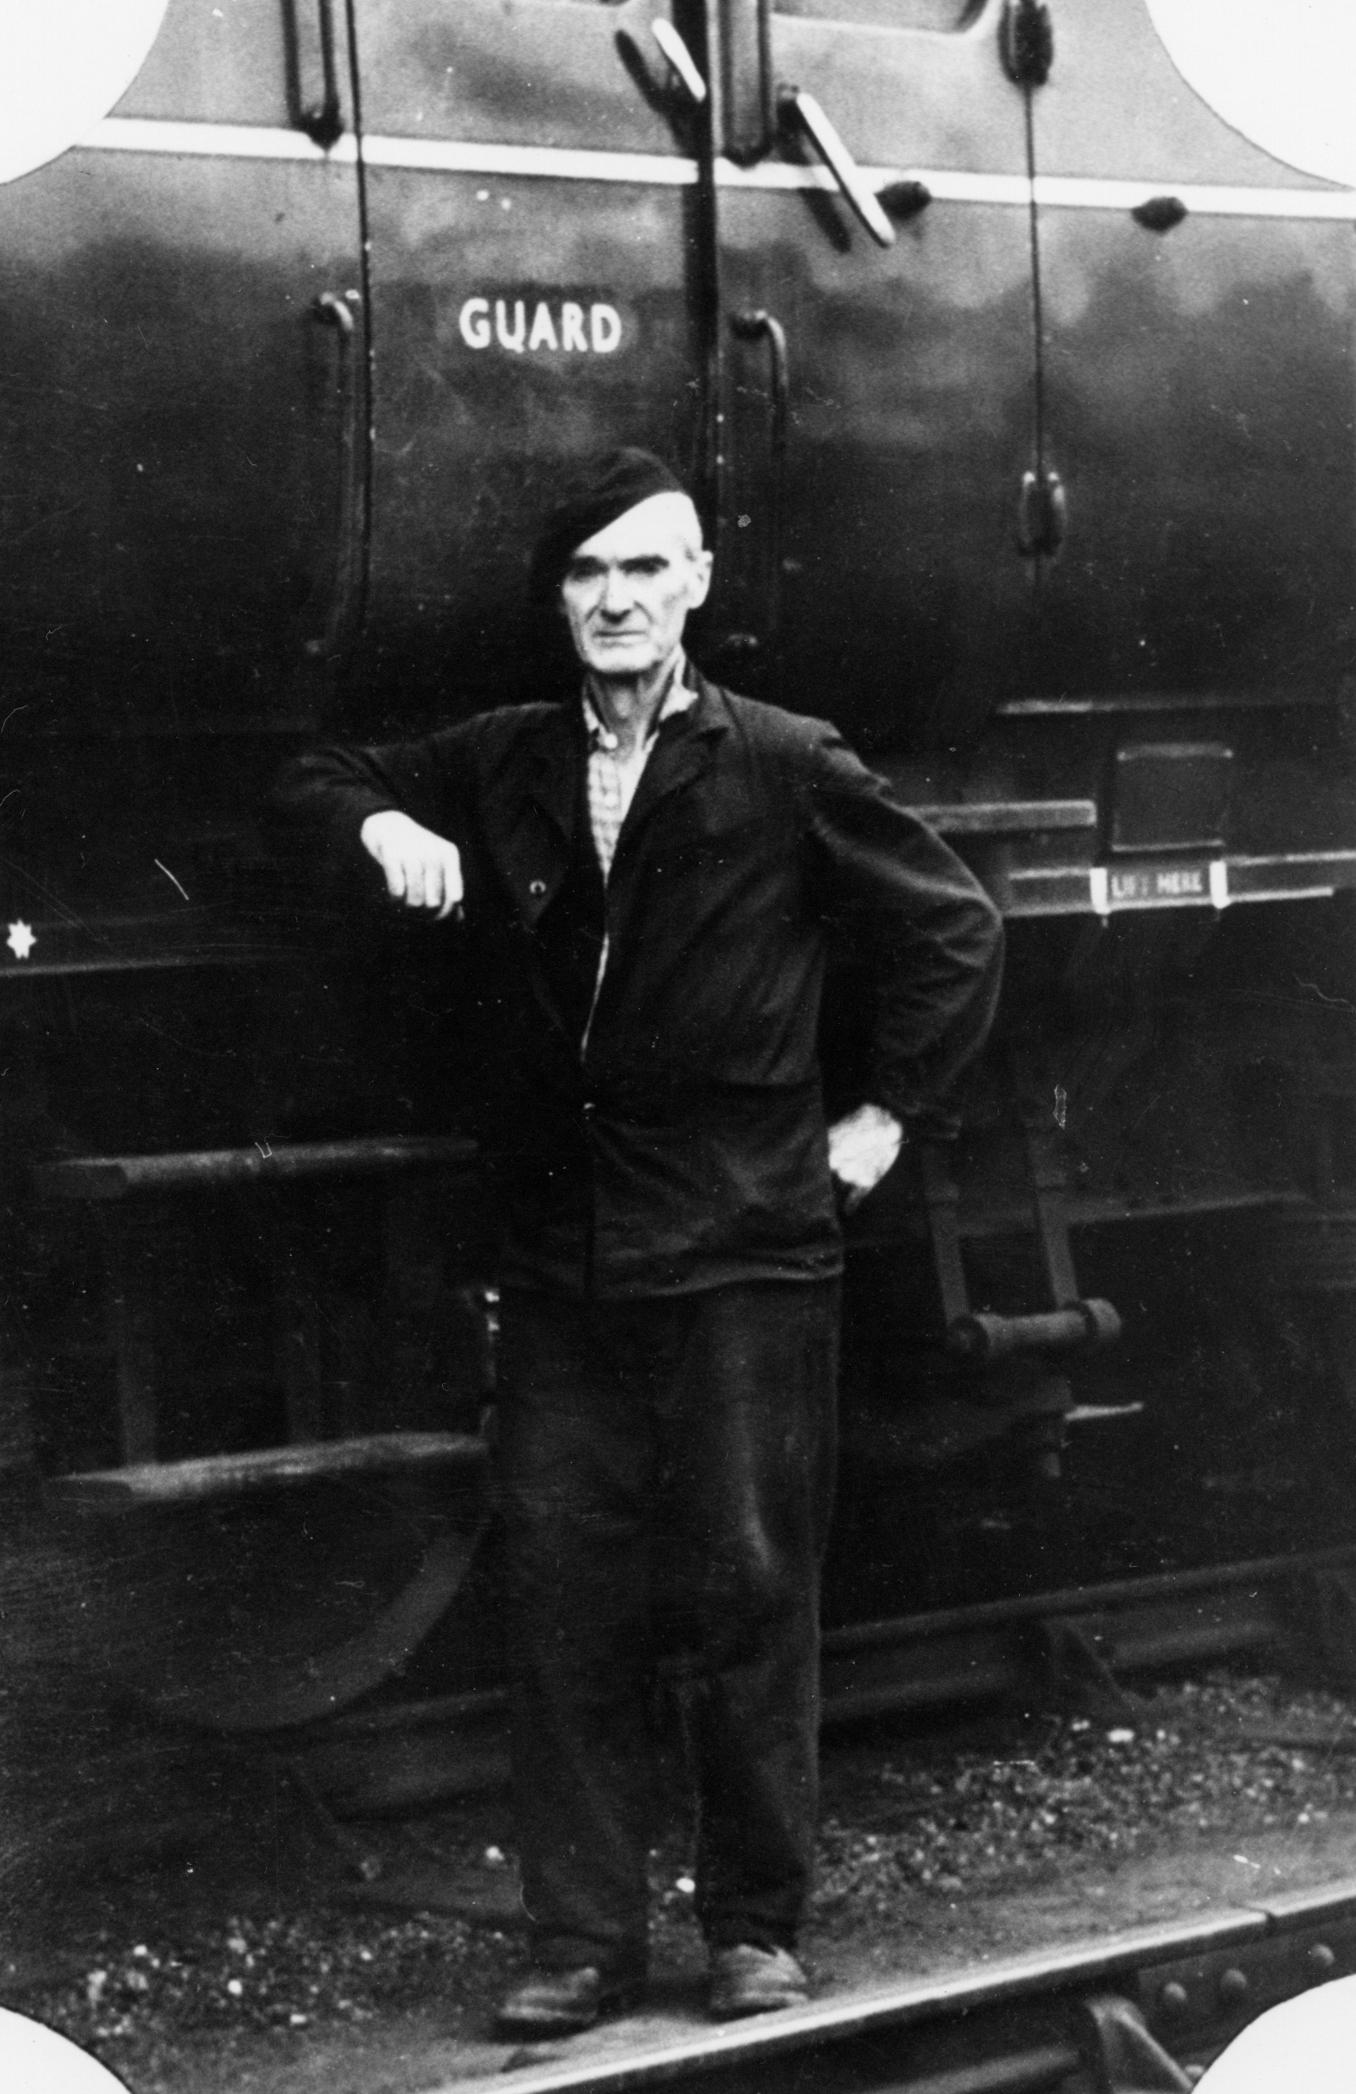 Stoker, late 1940s